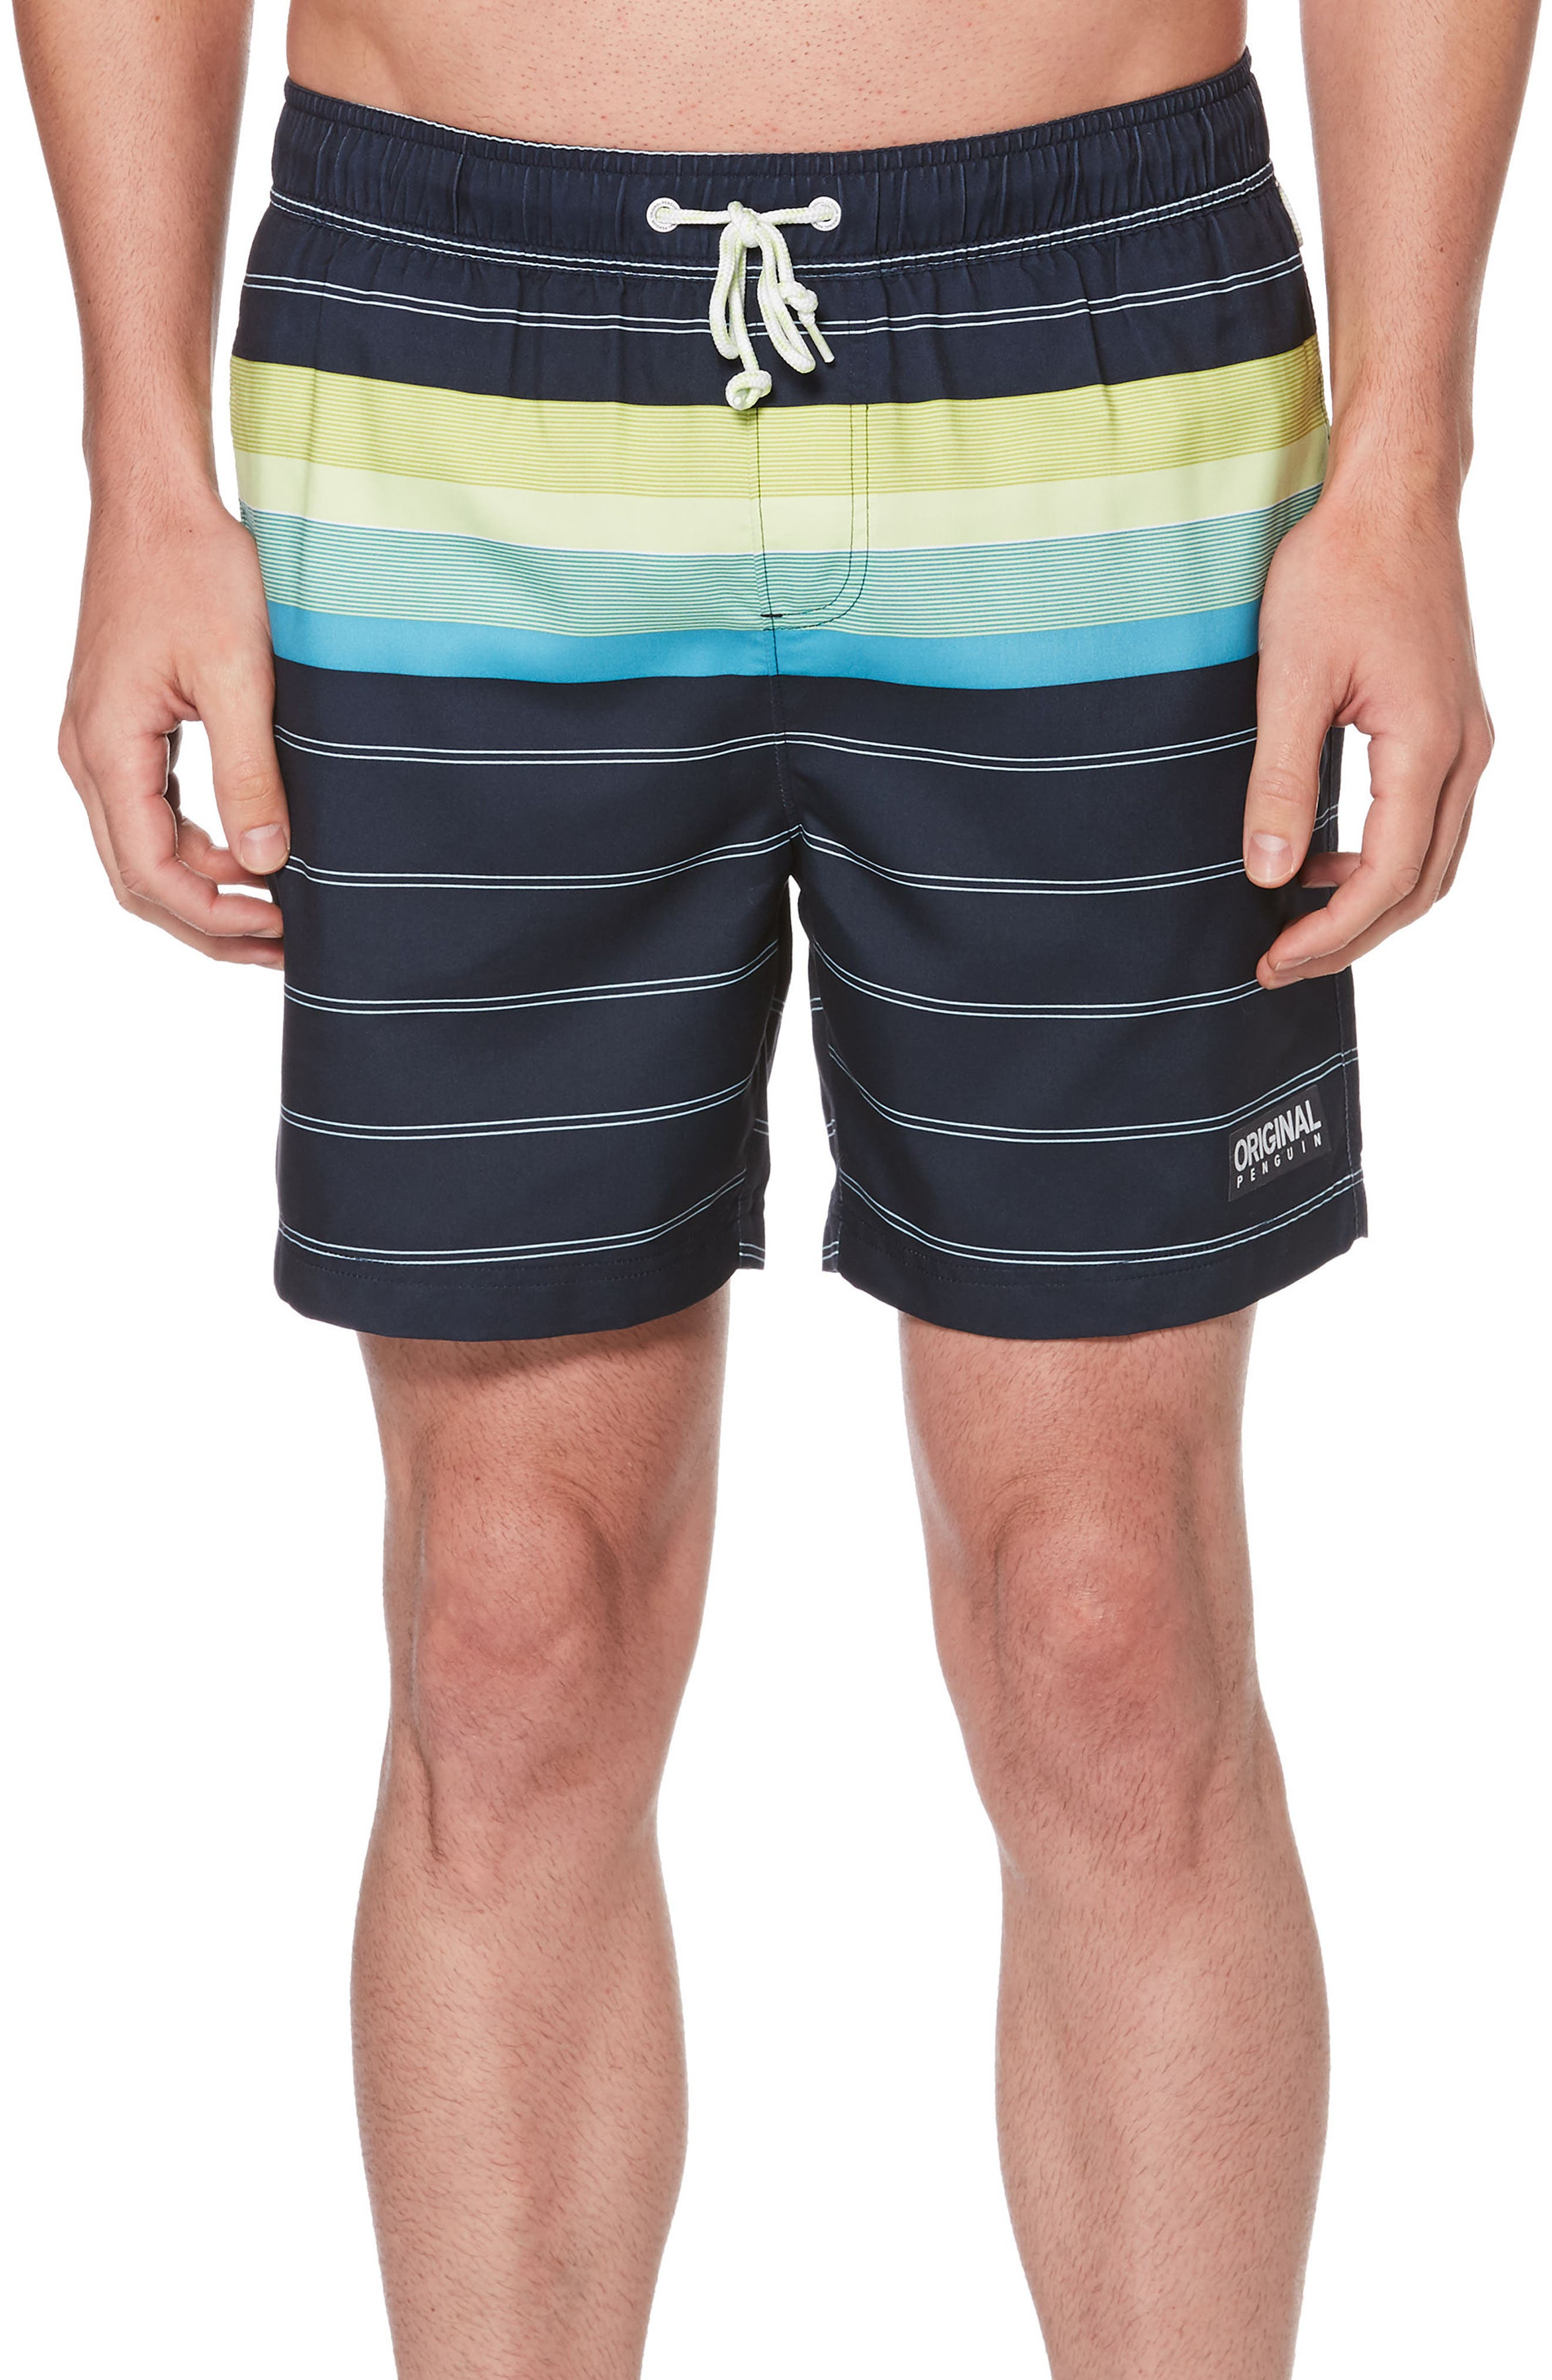 Engineered Stripe Swim Trunks,                         Main,                         color, DARK SAPPHIRE